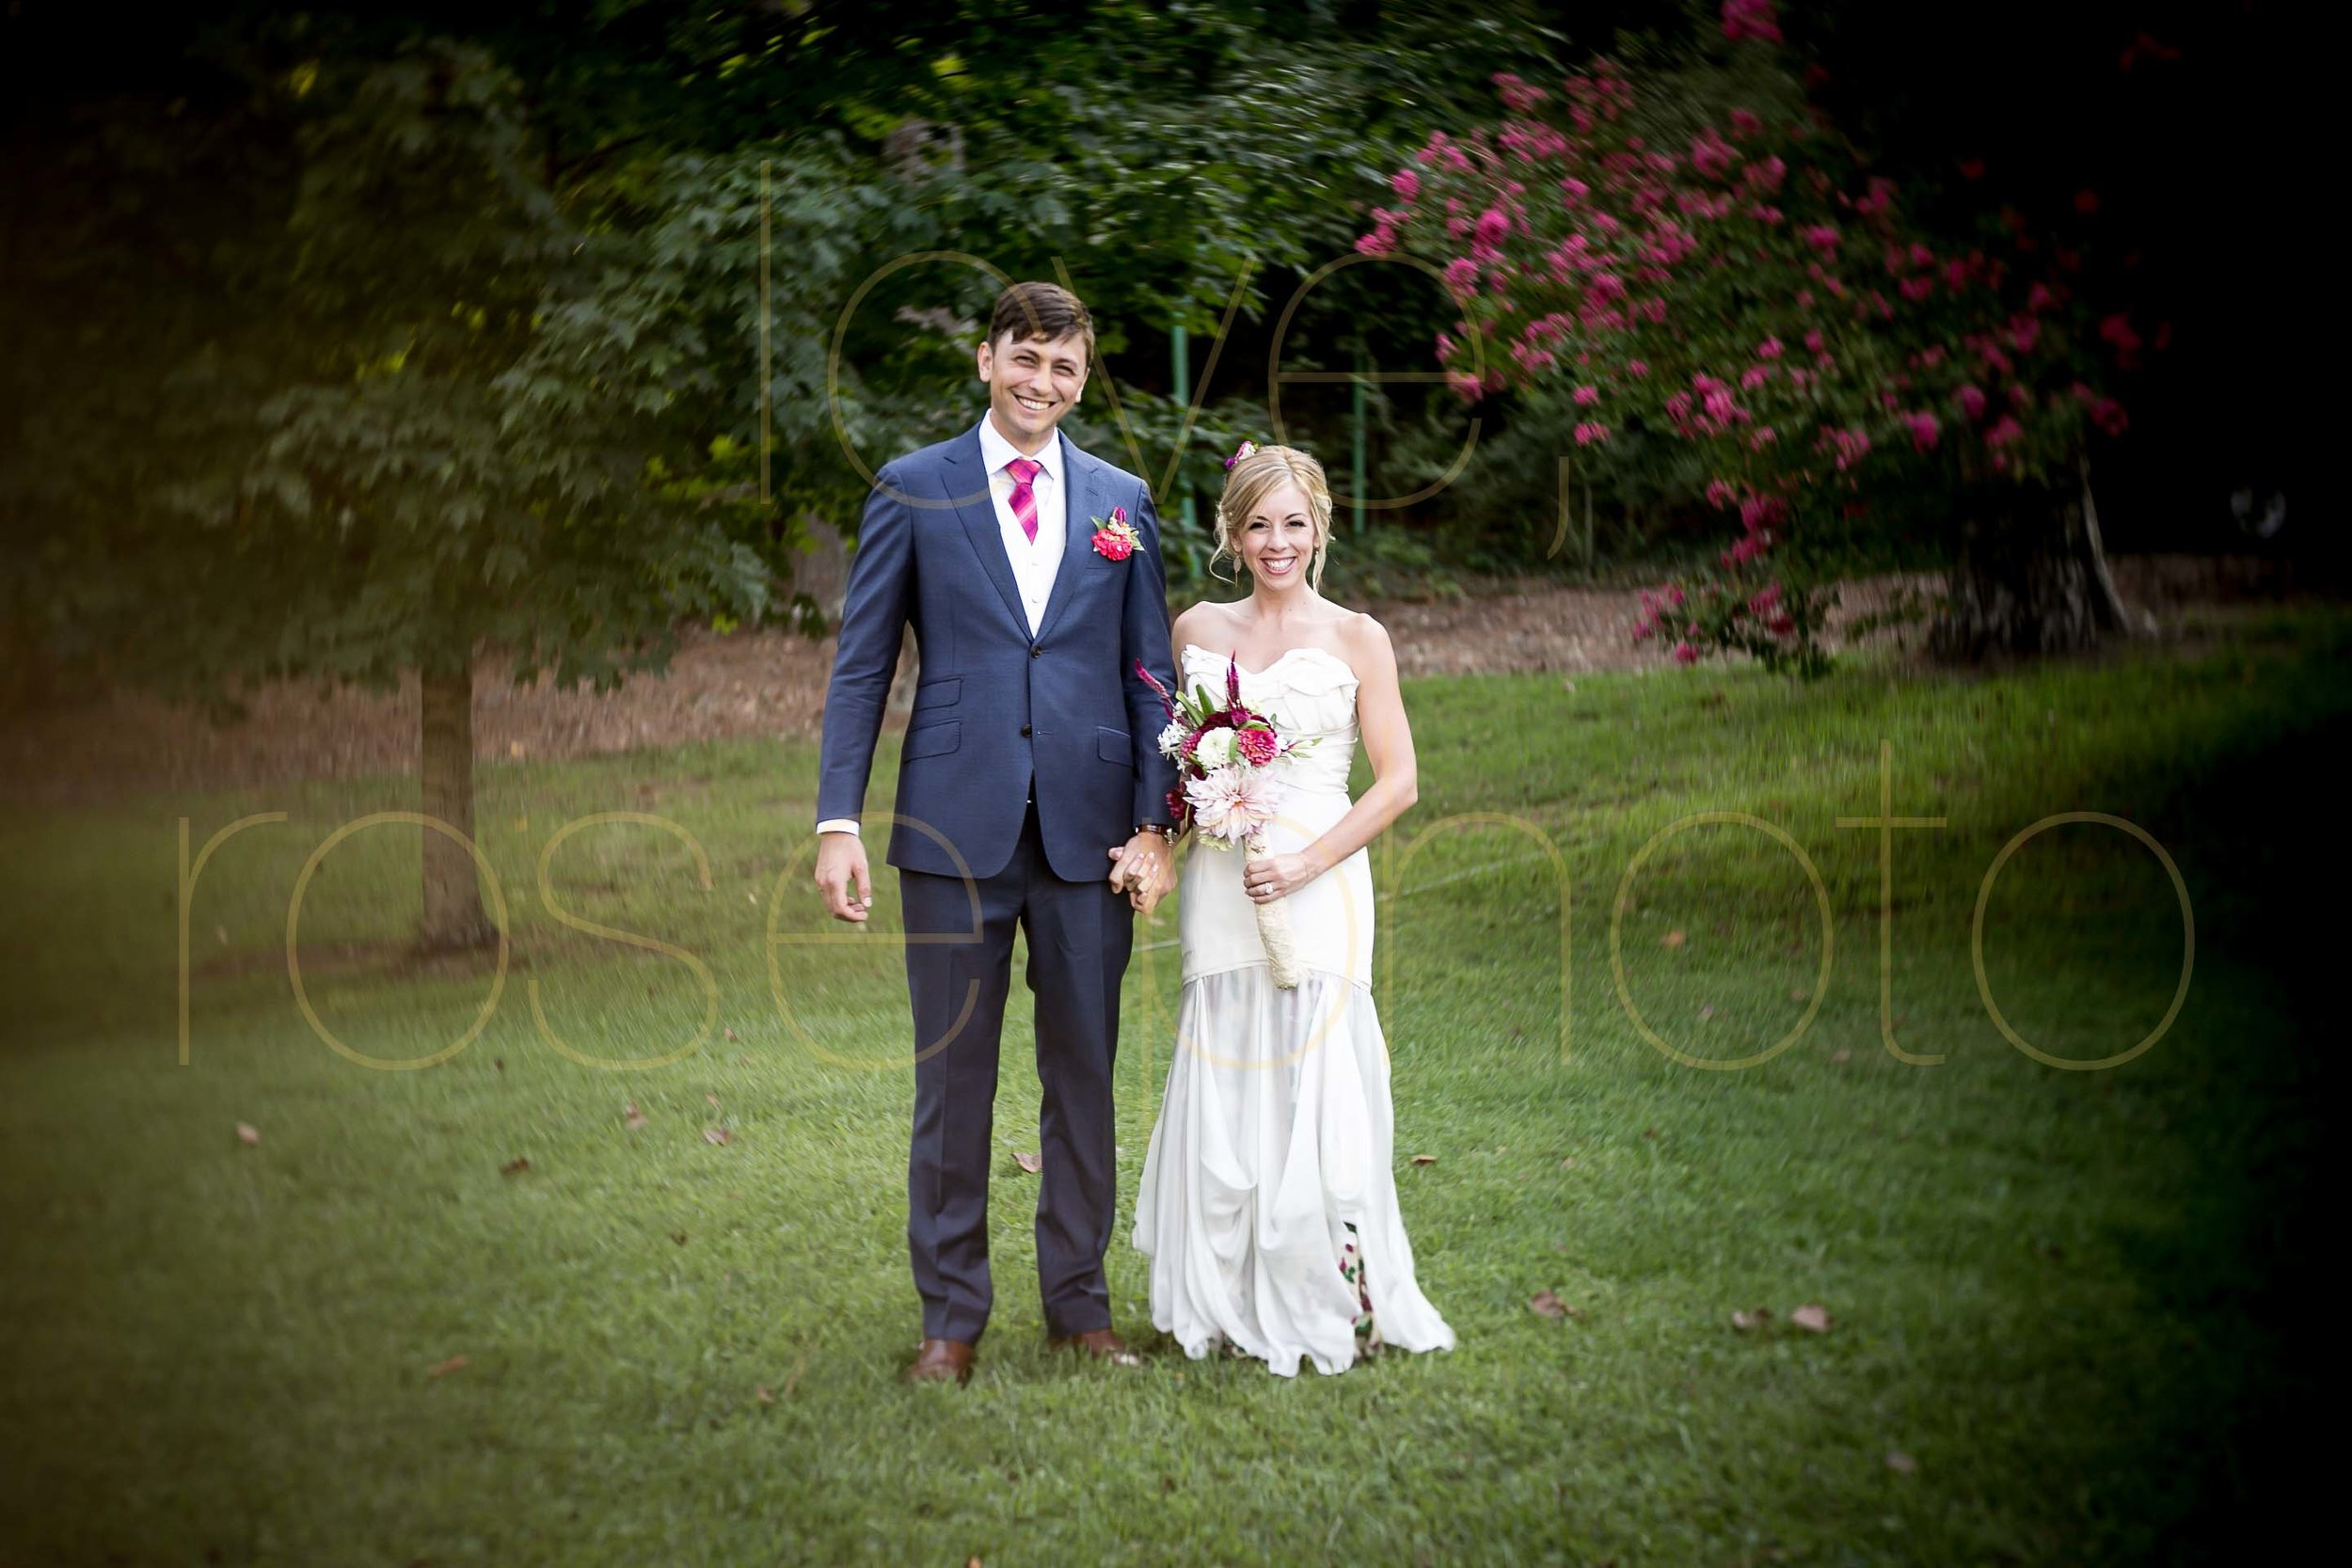 Rose Photo Asheville Wedding Photographer Nasheville Weddings Charleston Bride Chicago photojournalist weddings -51.jpg